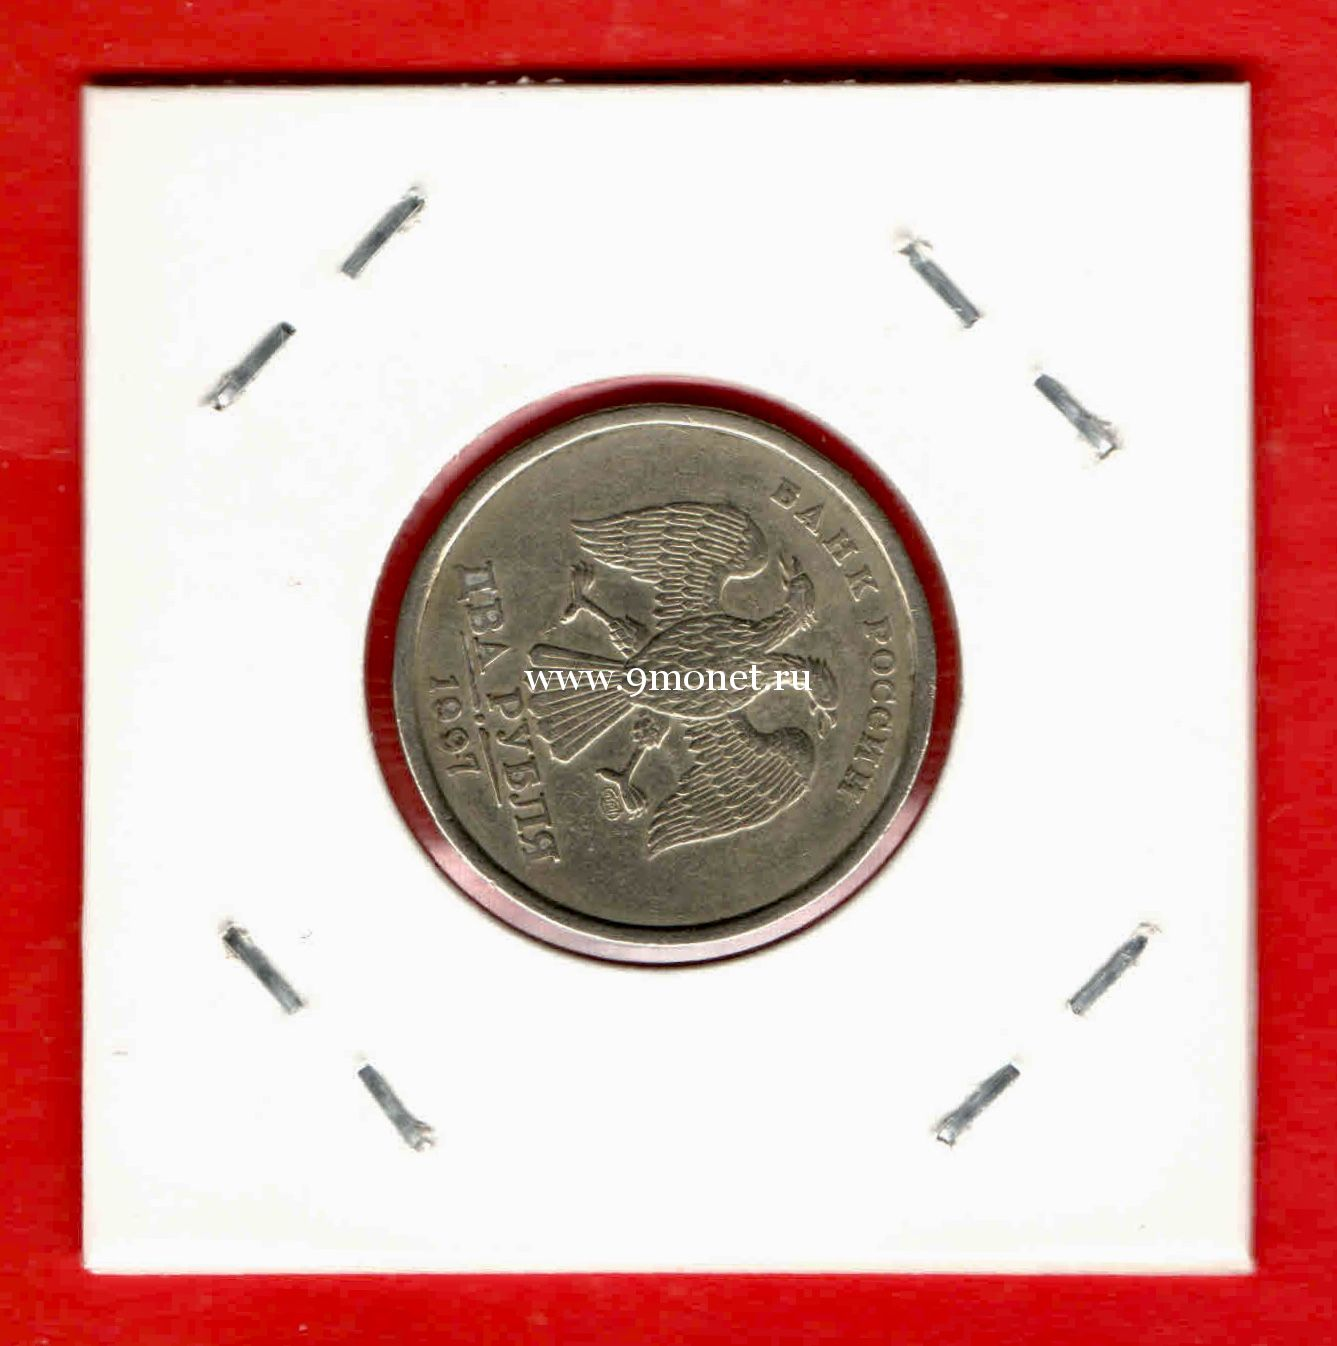 Россия монета с браком 2 рубля 1997 года СПМД. (поворот)